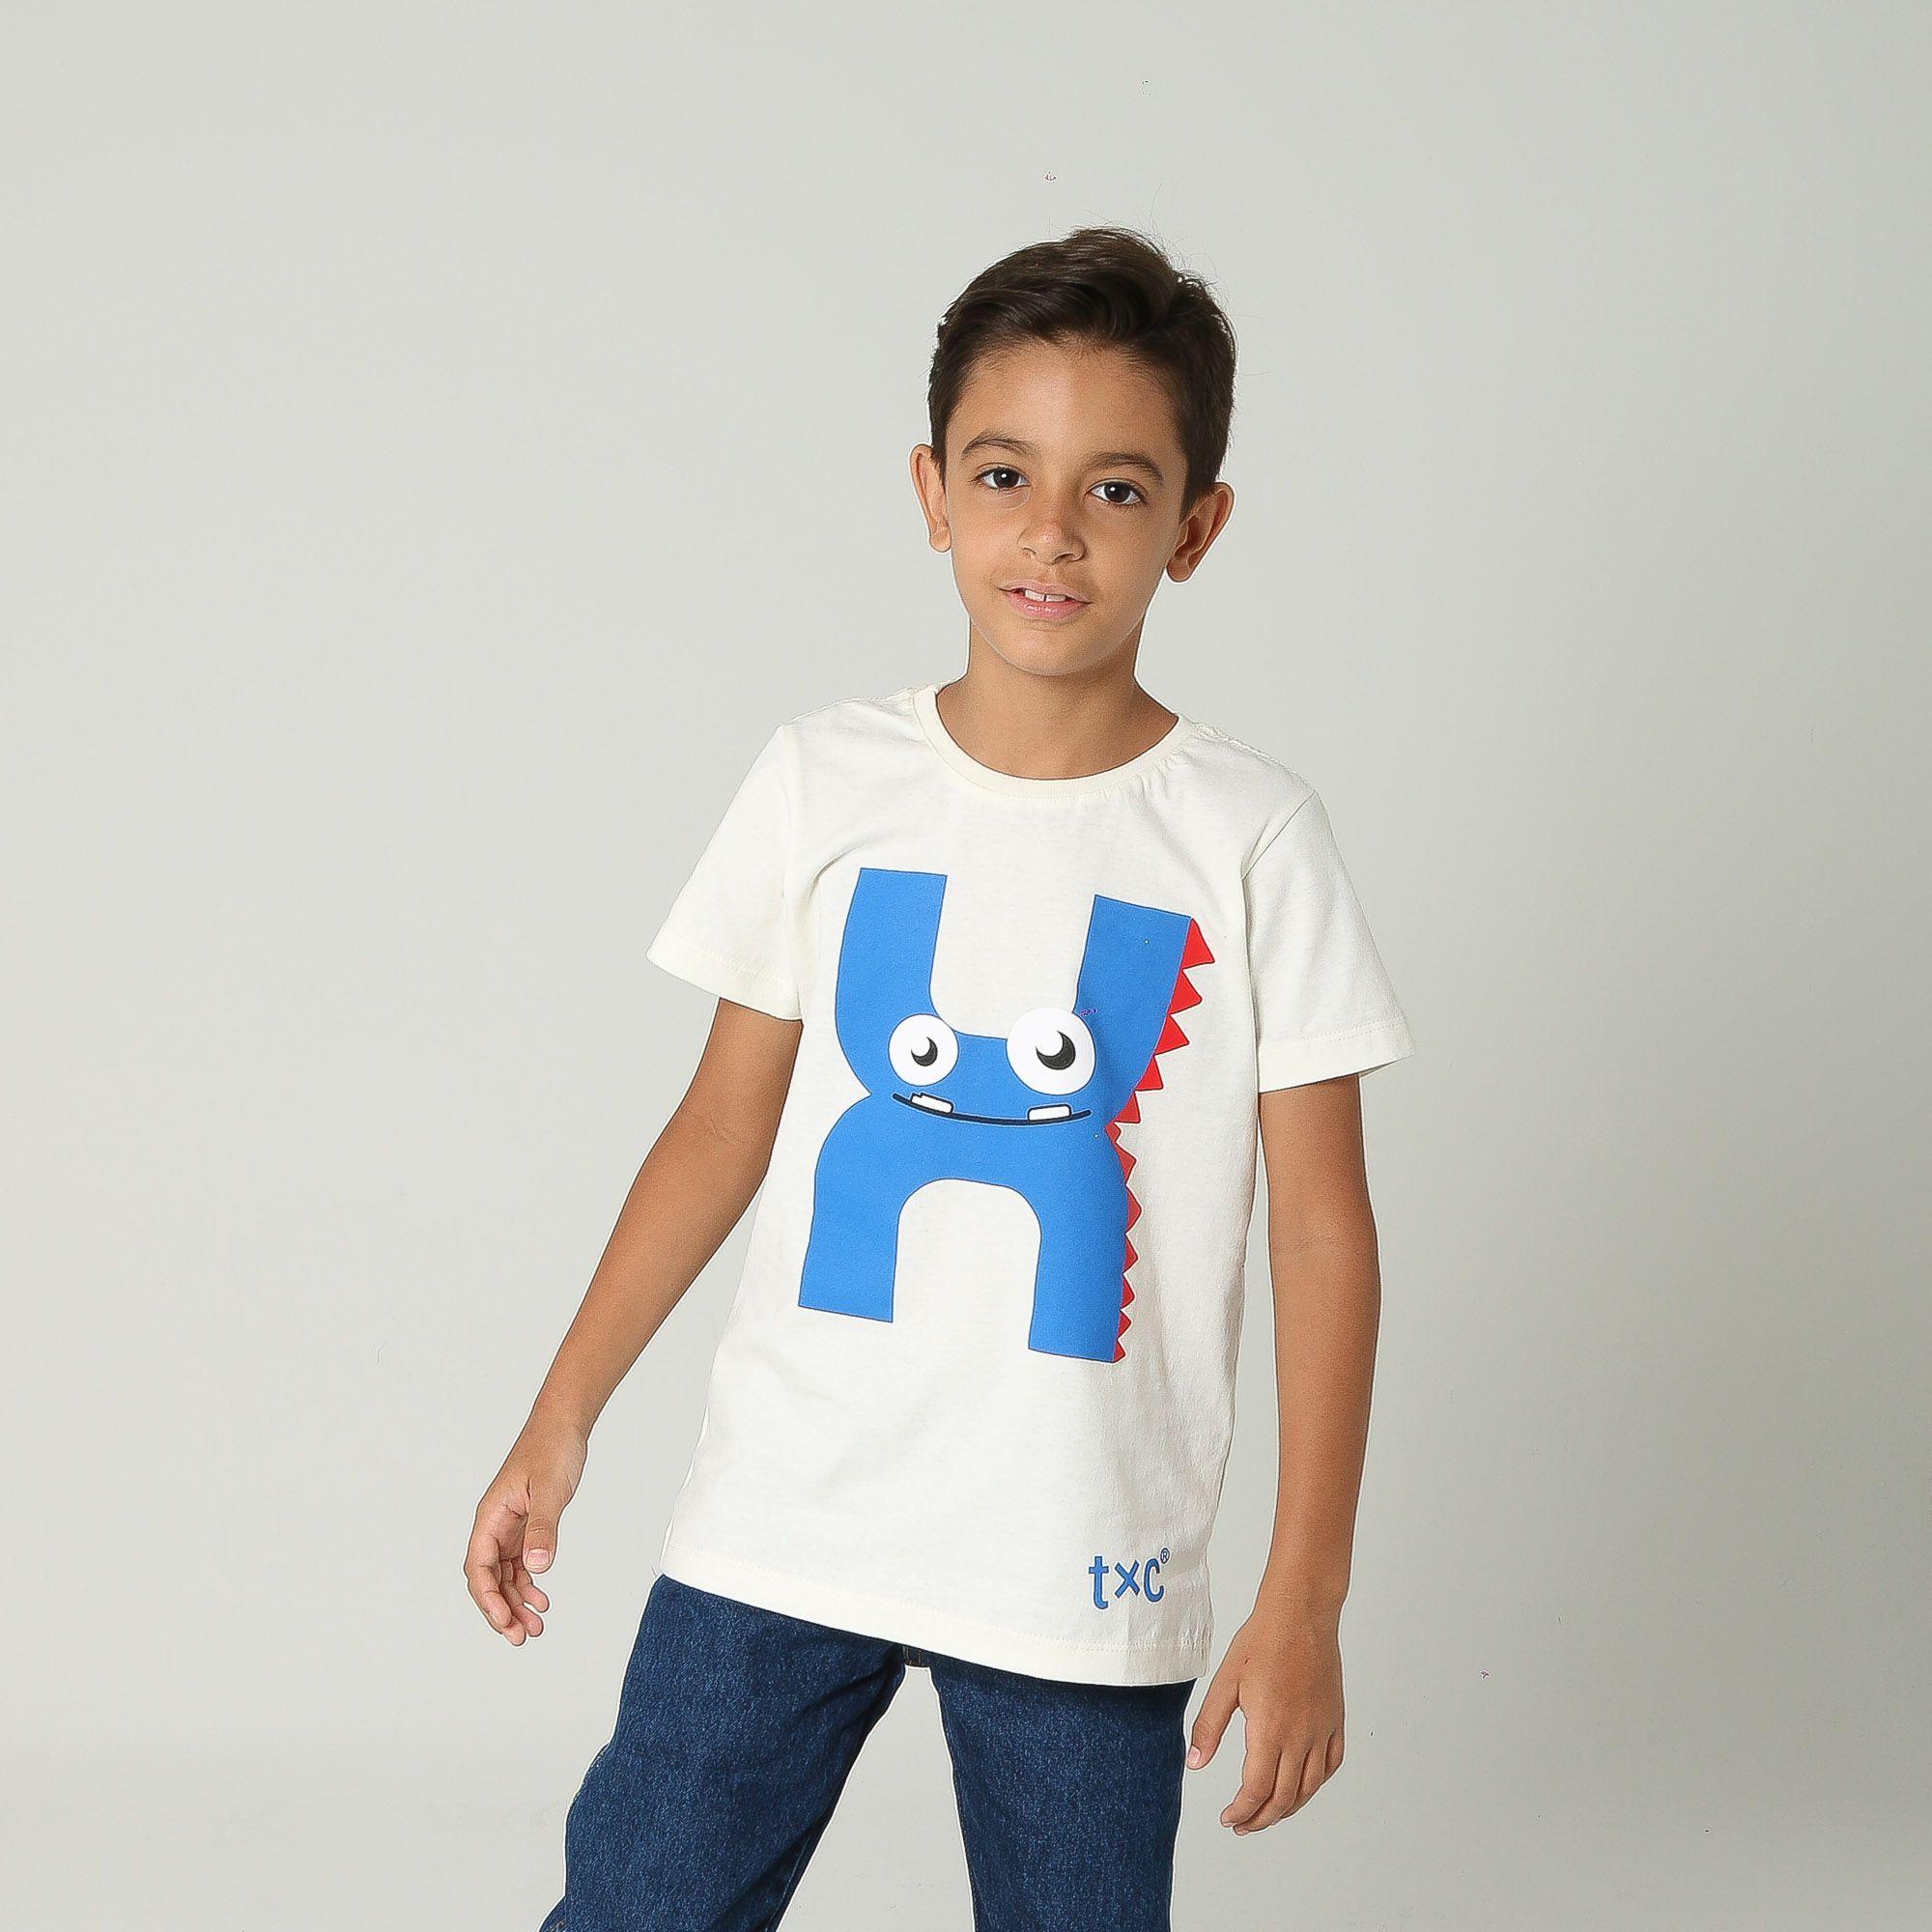 Camiseta TXC Brand Infantil 14083